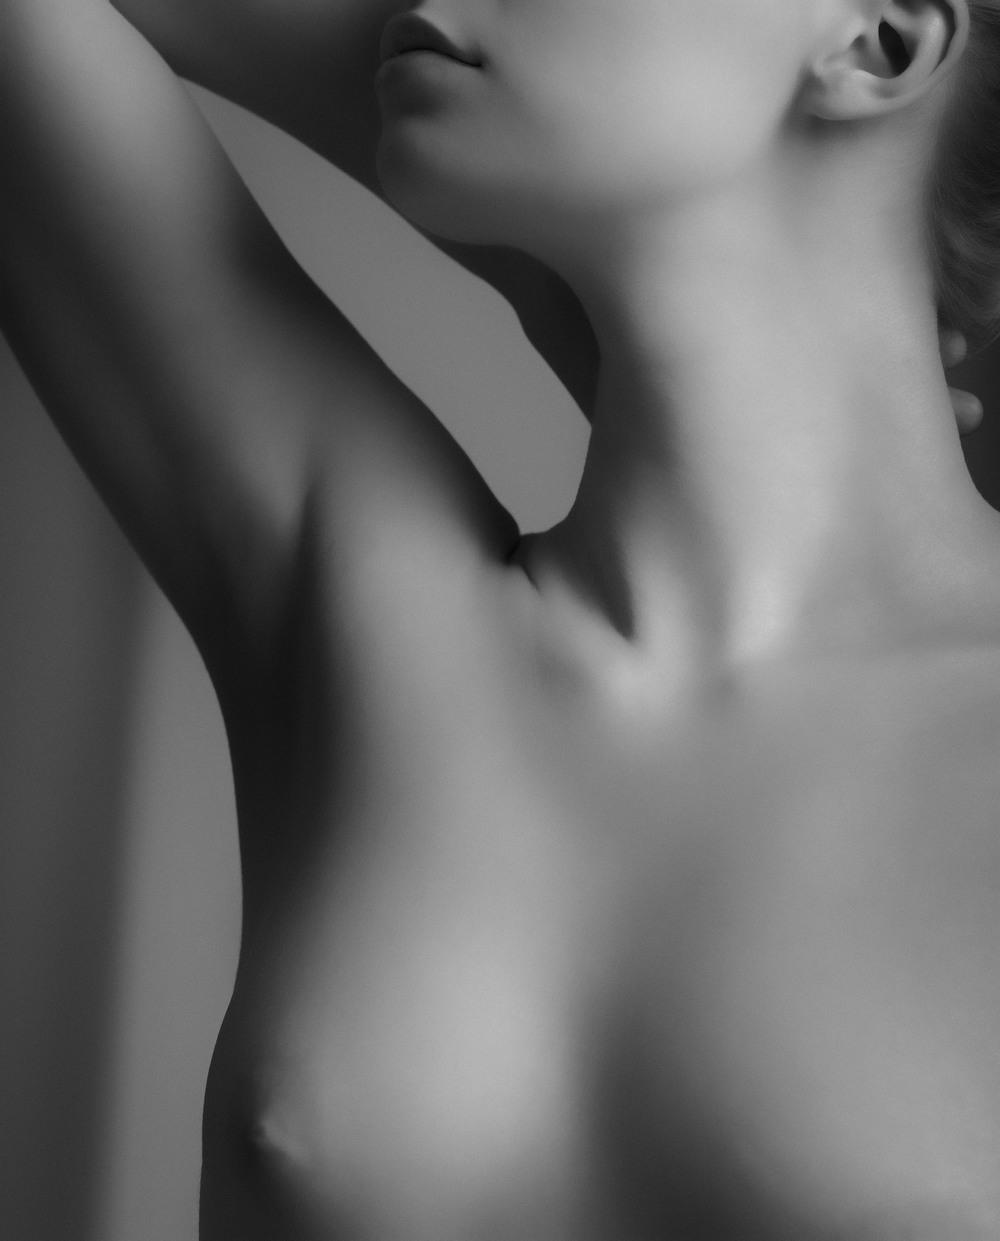 Rodin_2013-02-23_11-36-49_L1001275_©JosephLinaschke2013.jpg